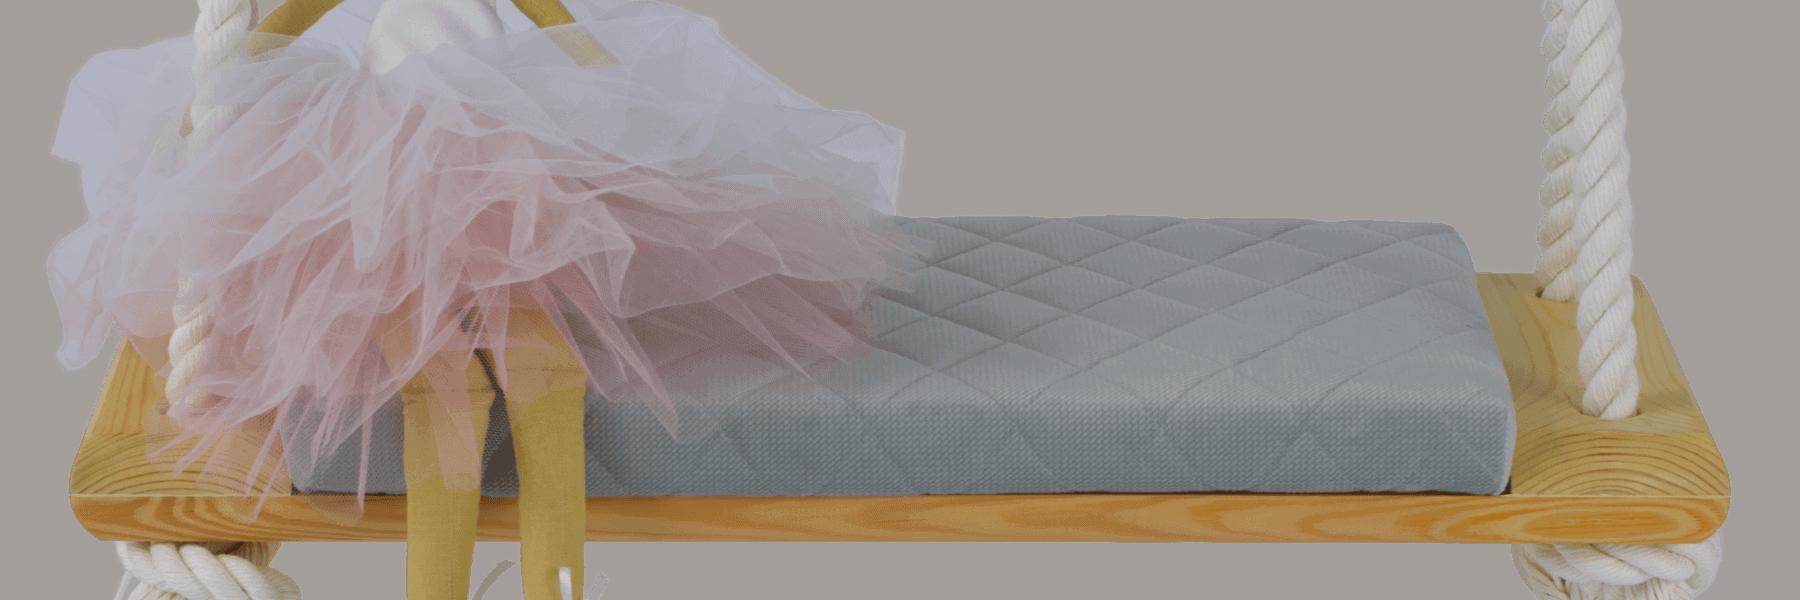 Huśtawka Comfort+ – Różowy, Naturalny